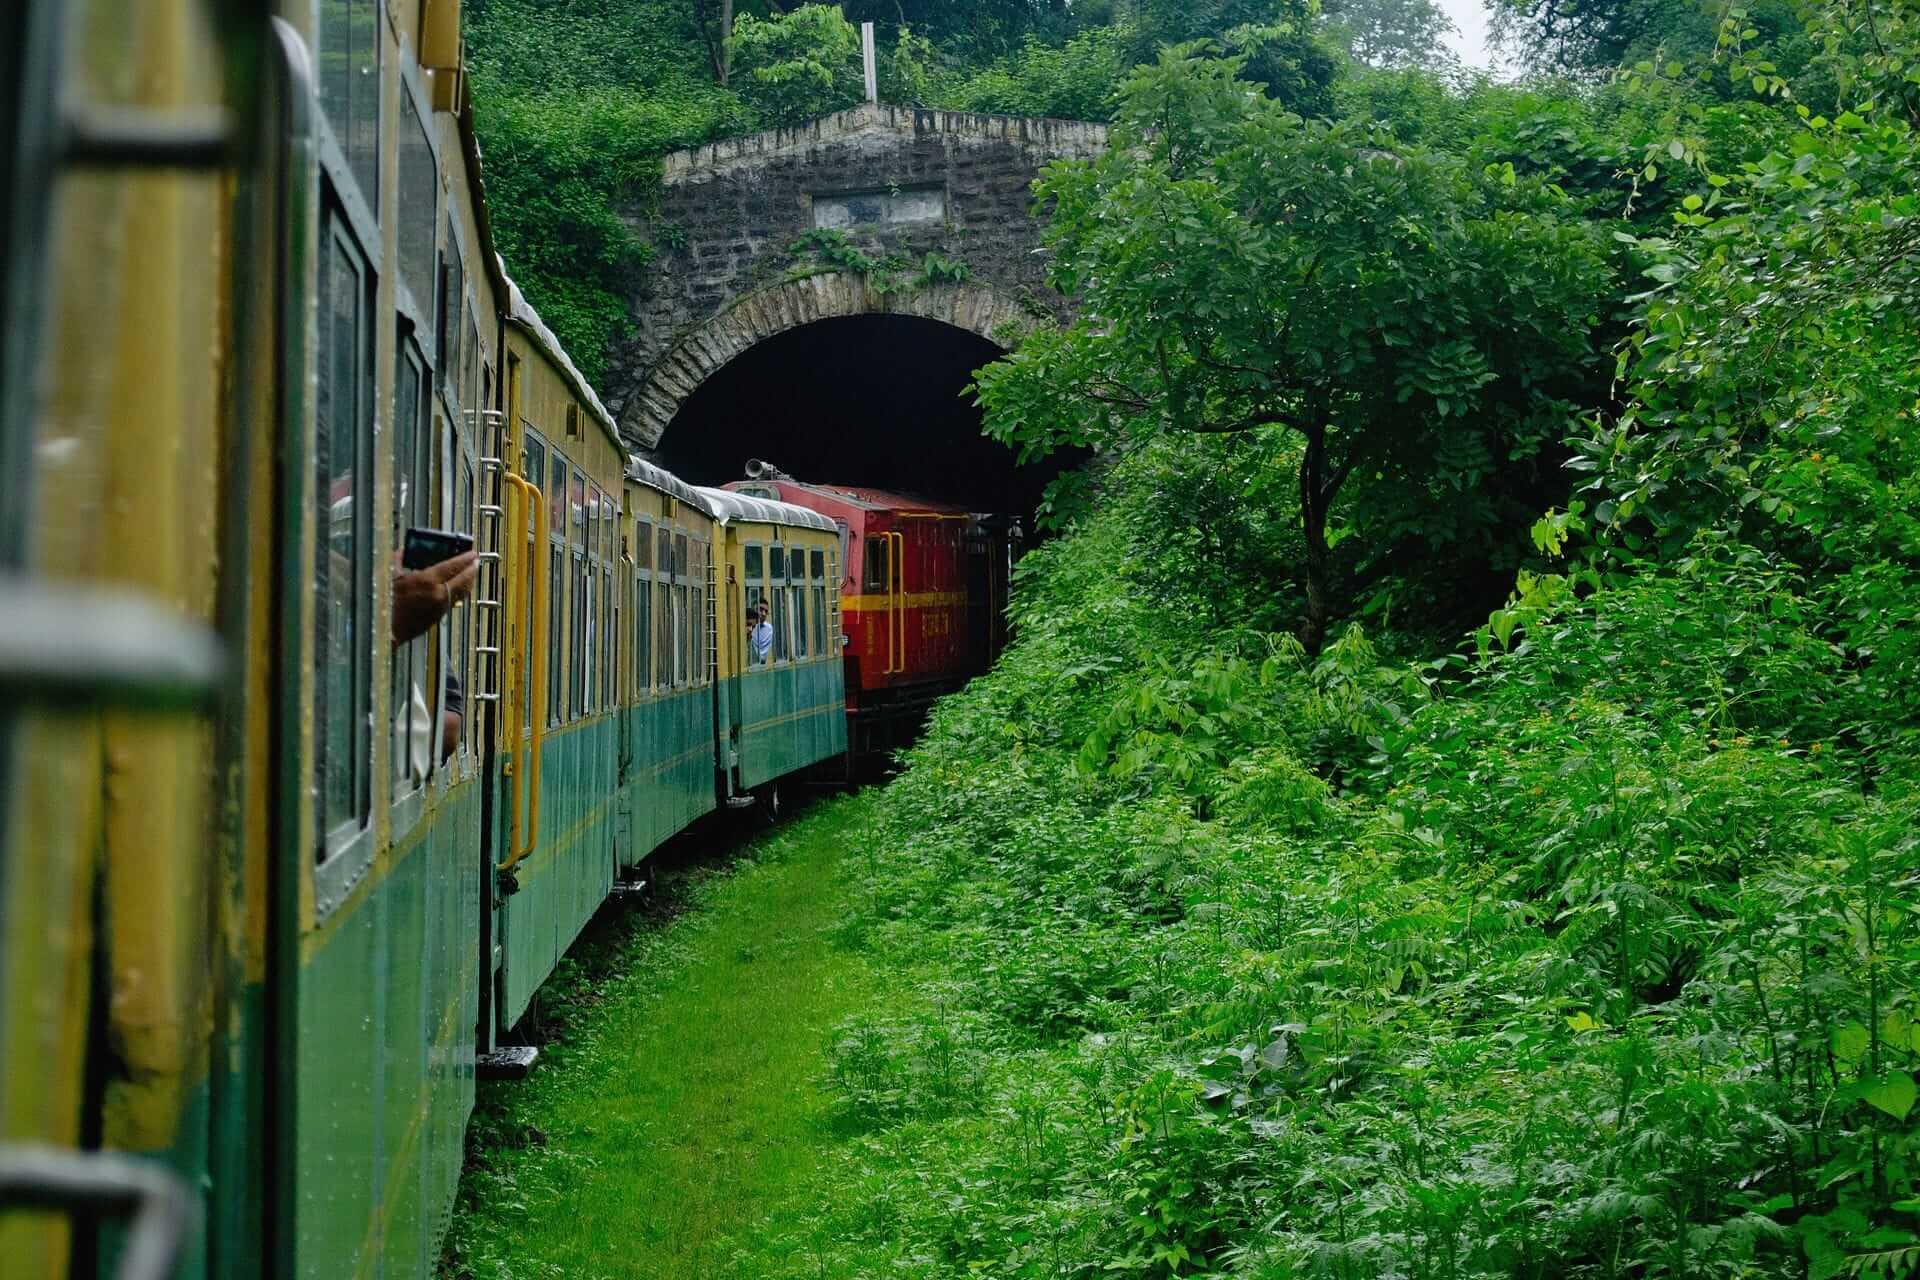 6Nts Shimla Manali Chandigarh